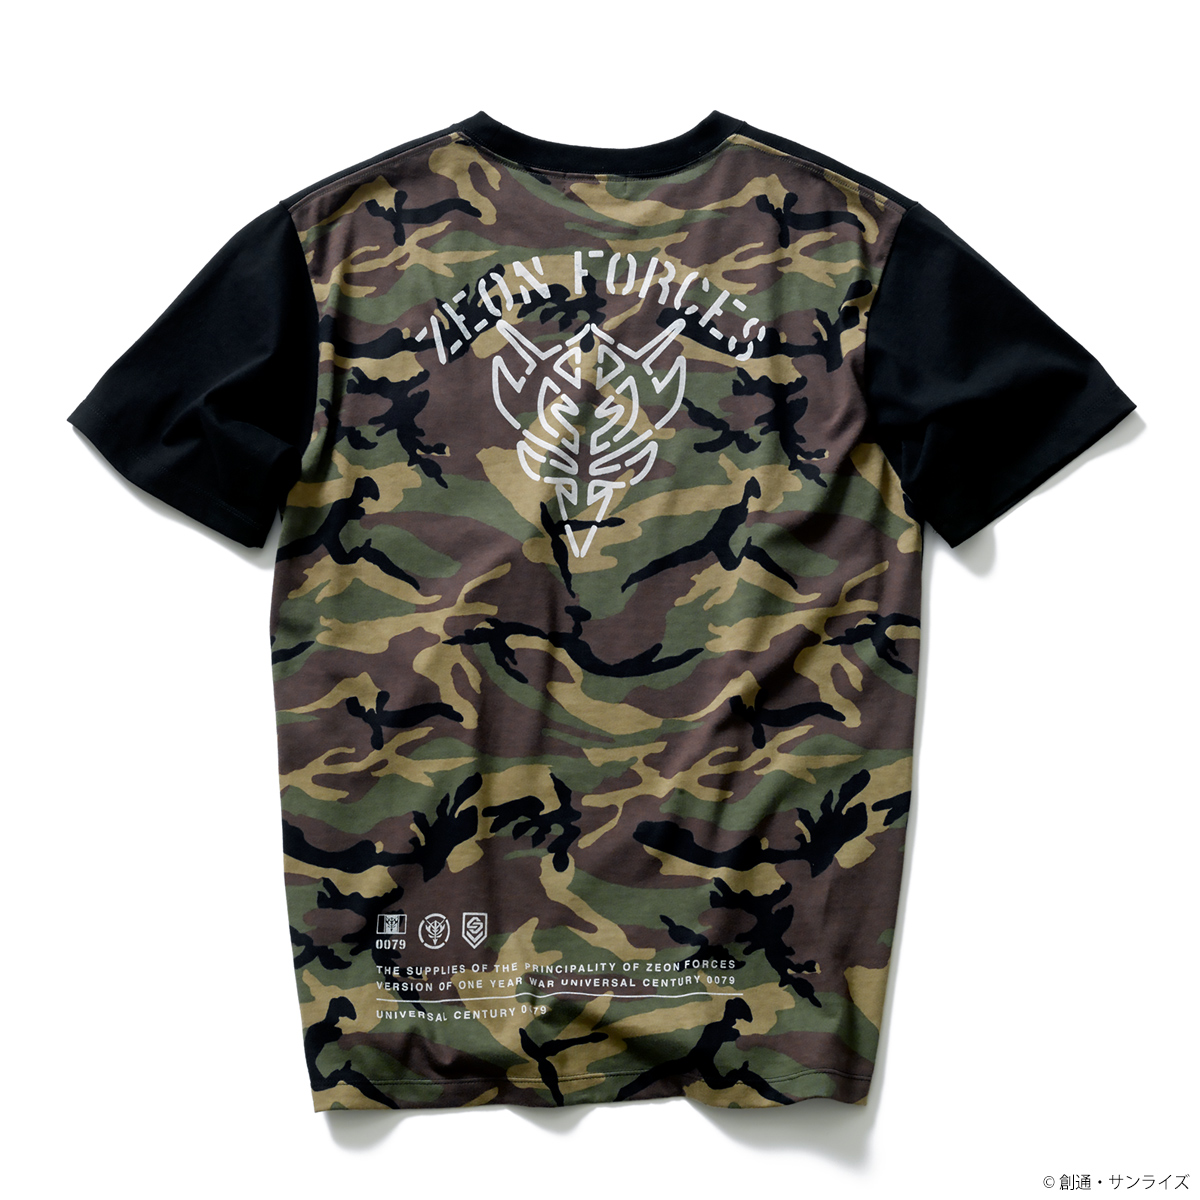 STRICT-G.ARMS『機動戦士ガンダム』 カモフラージュ切替ポケットTシャツ ZEON FORCES